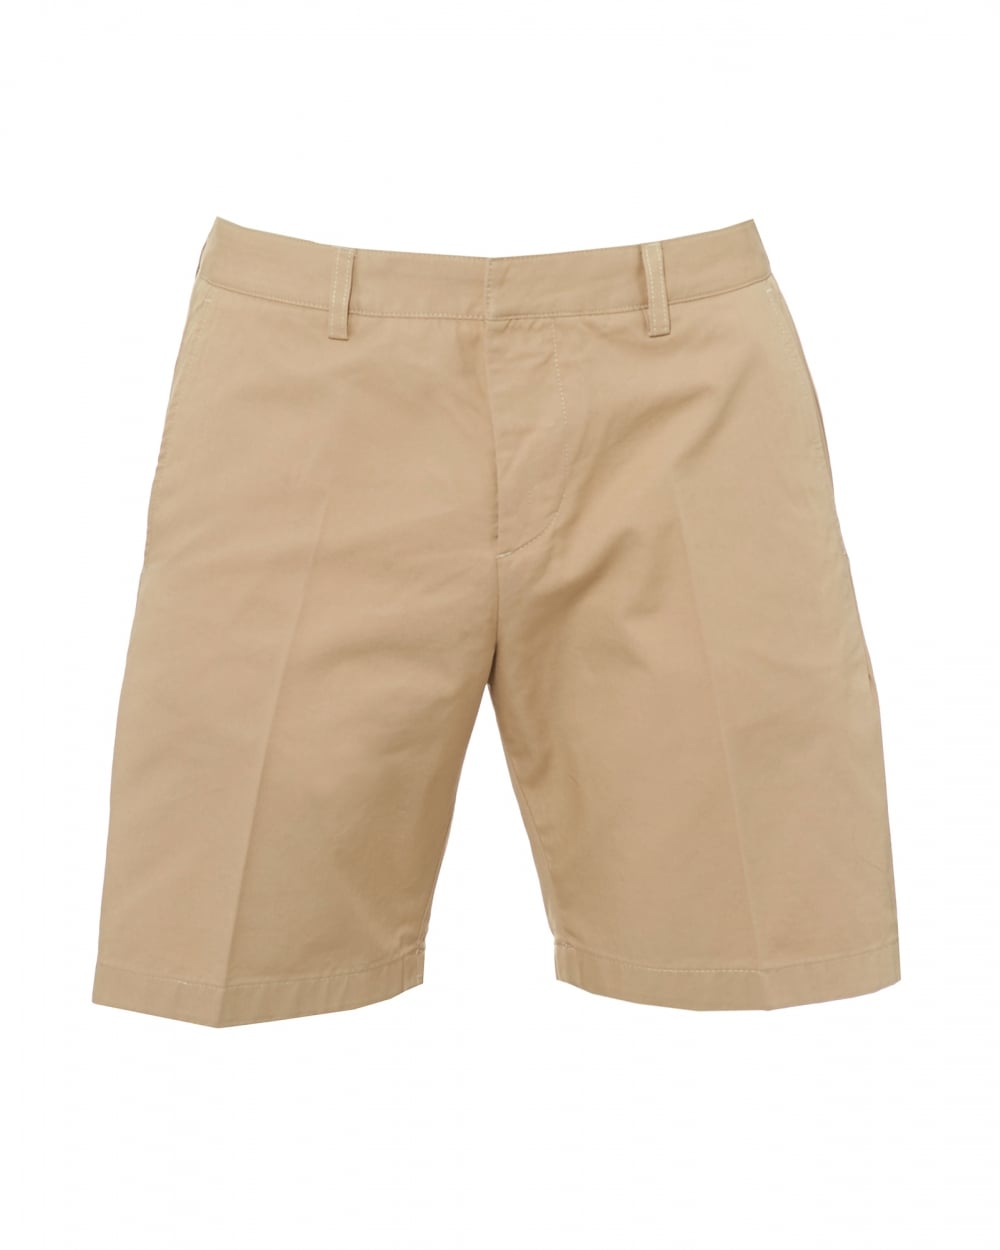 Stuccu: Best Deals on beige shorts men. Up To 70% off.